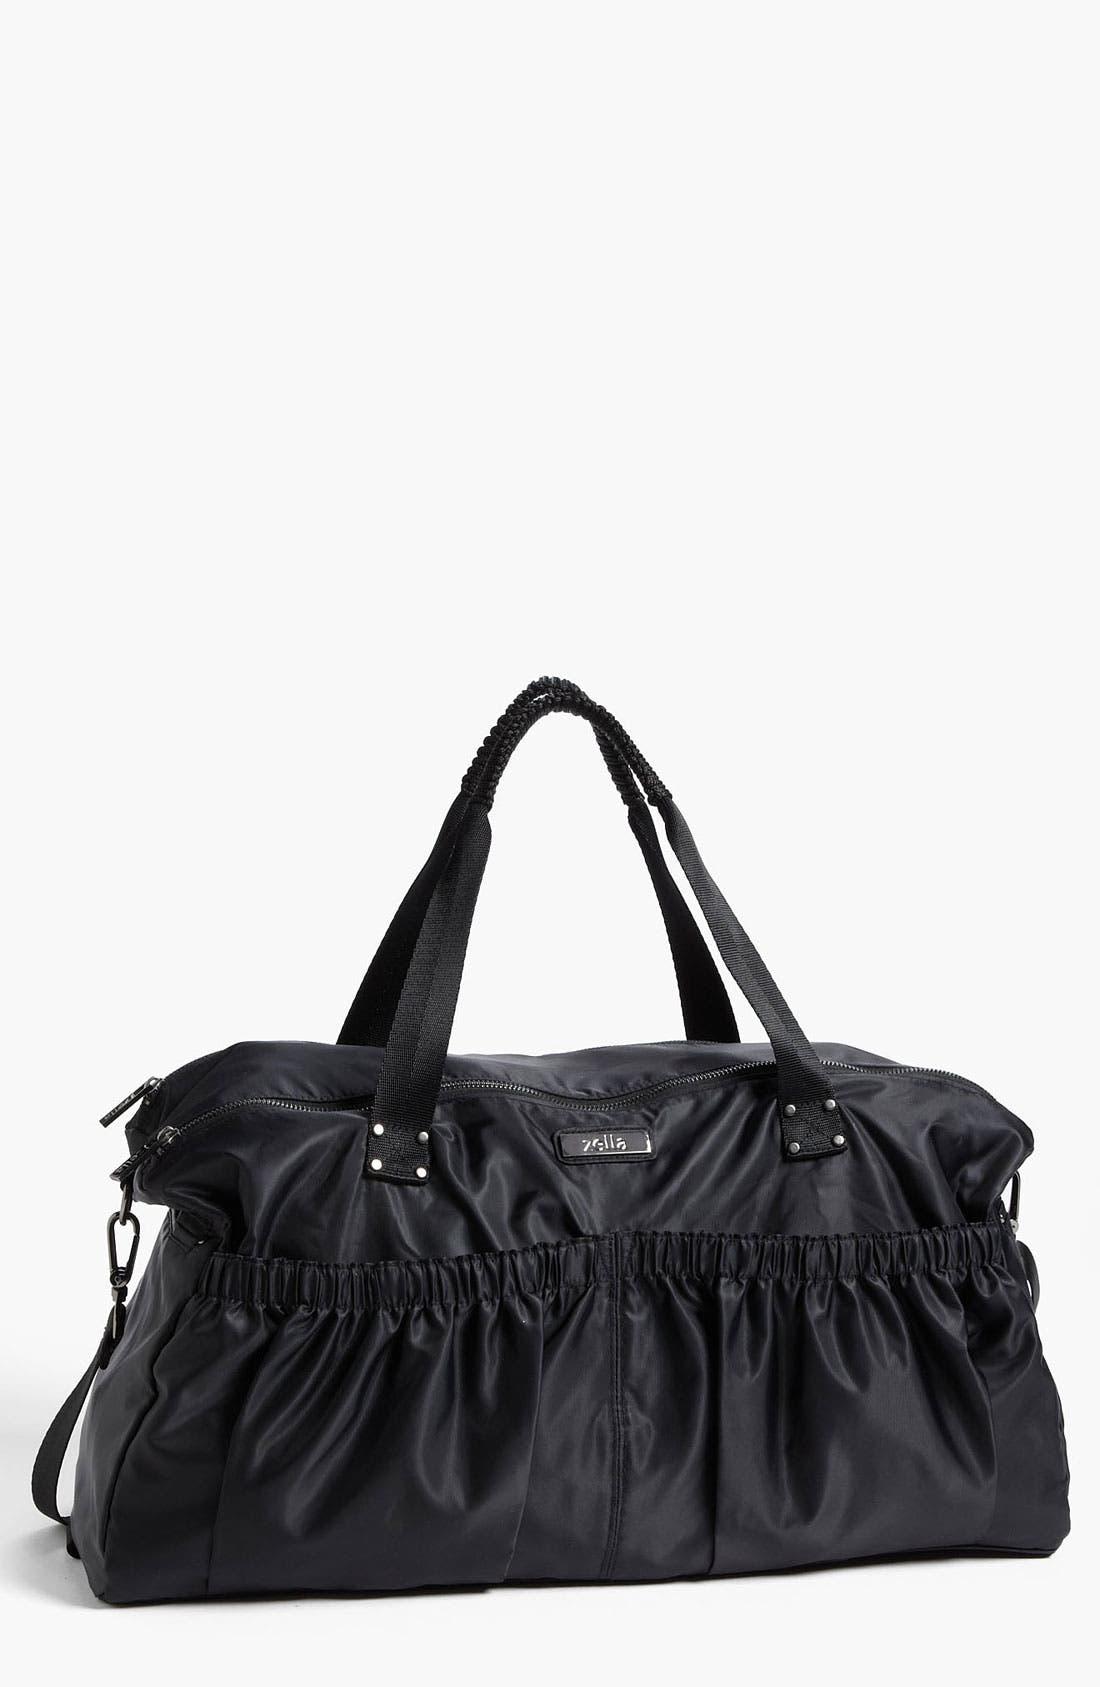 Main Image - Zella Pocketed Duffel Bag